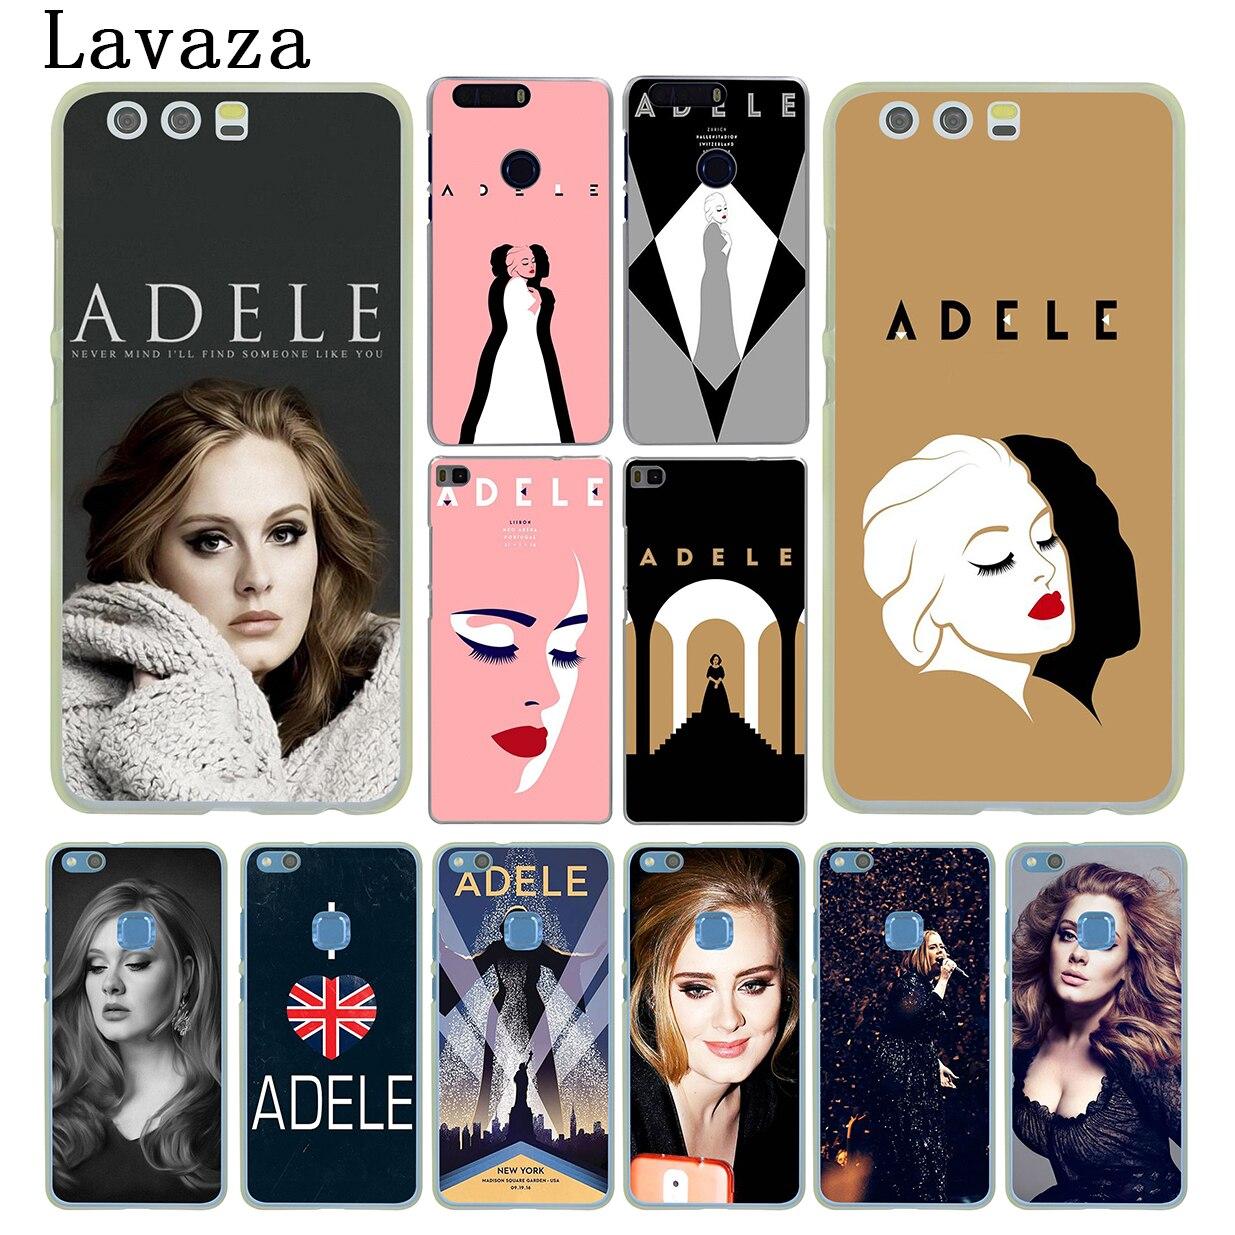 Lavaza Адель Эдкинс YOOX футляр для huawei P20 P10 P9 плюс P8 Lite мини 2015 2016 2017 P smart Коврики 10 9 Lite Pro